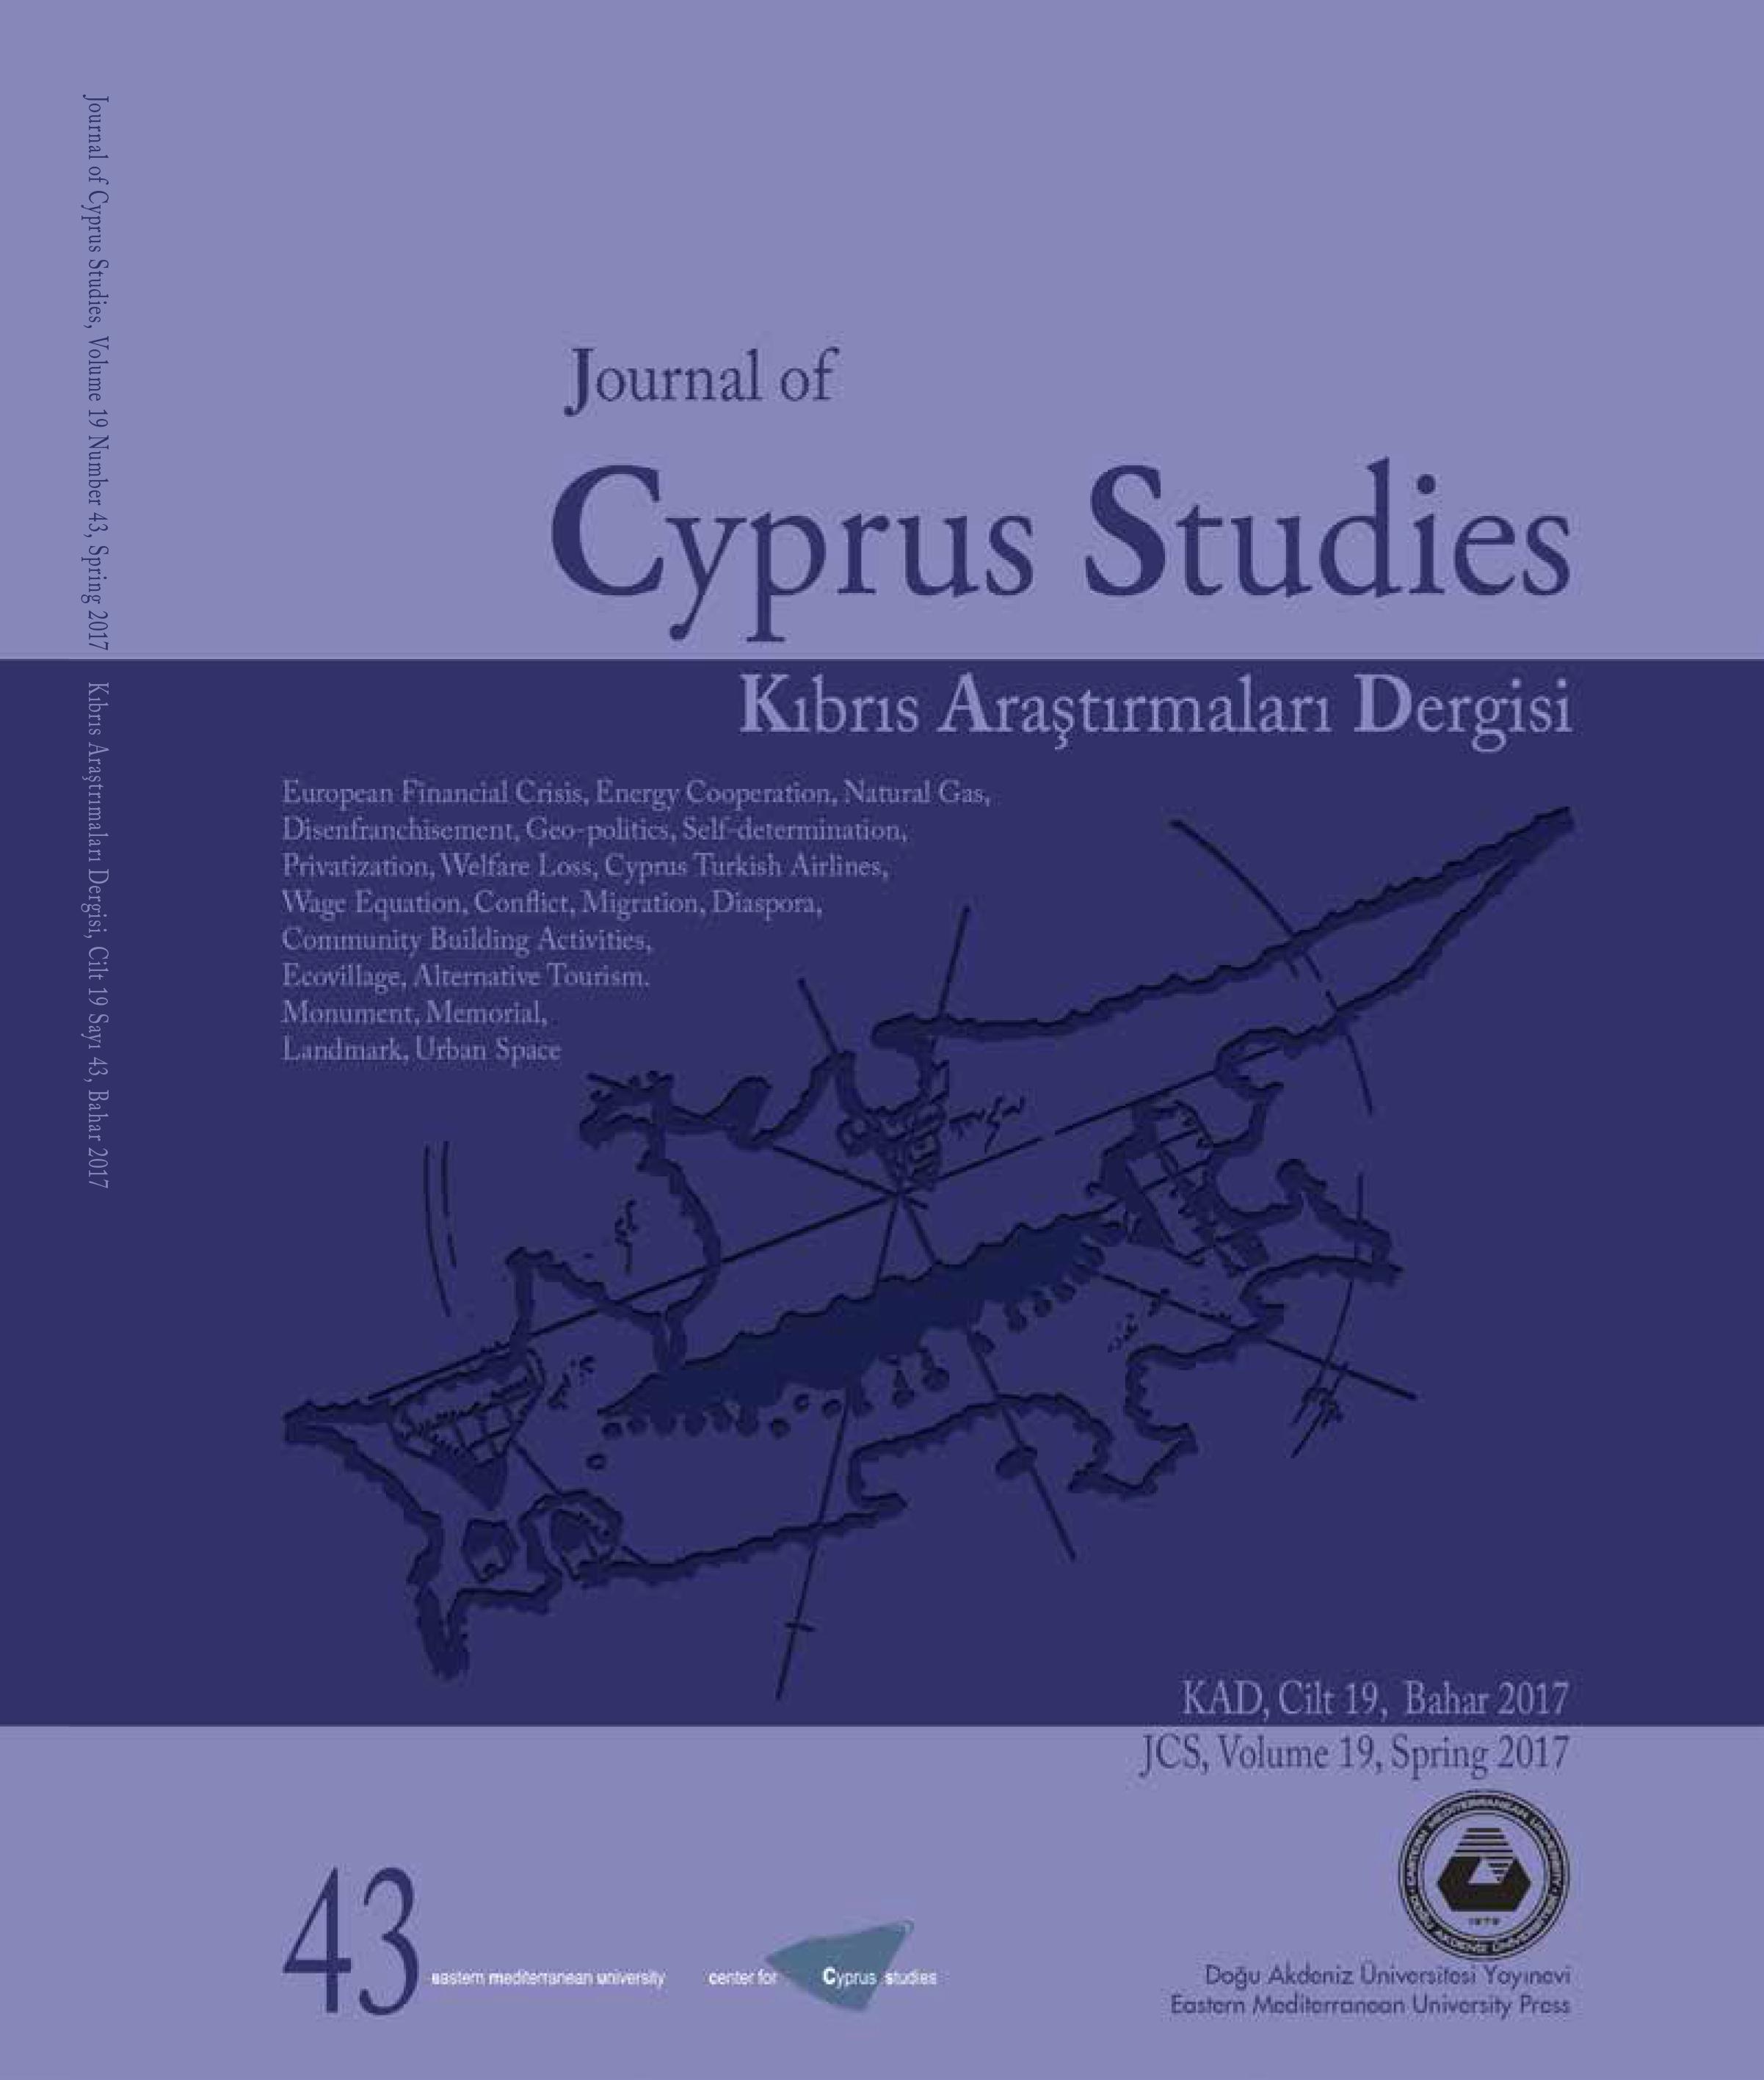 JCS 43 Vol 19